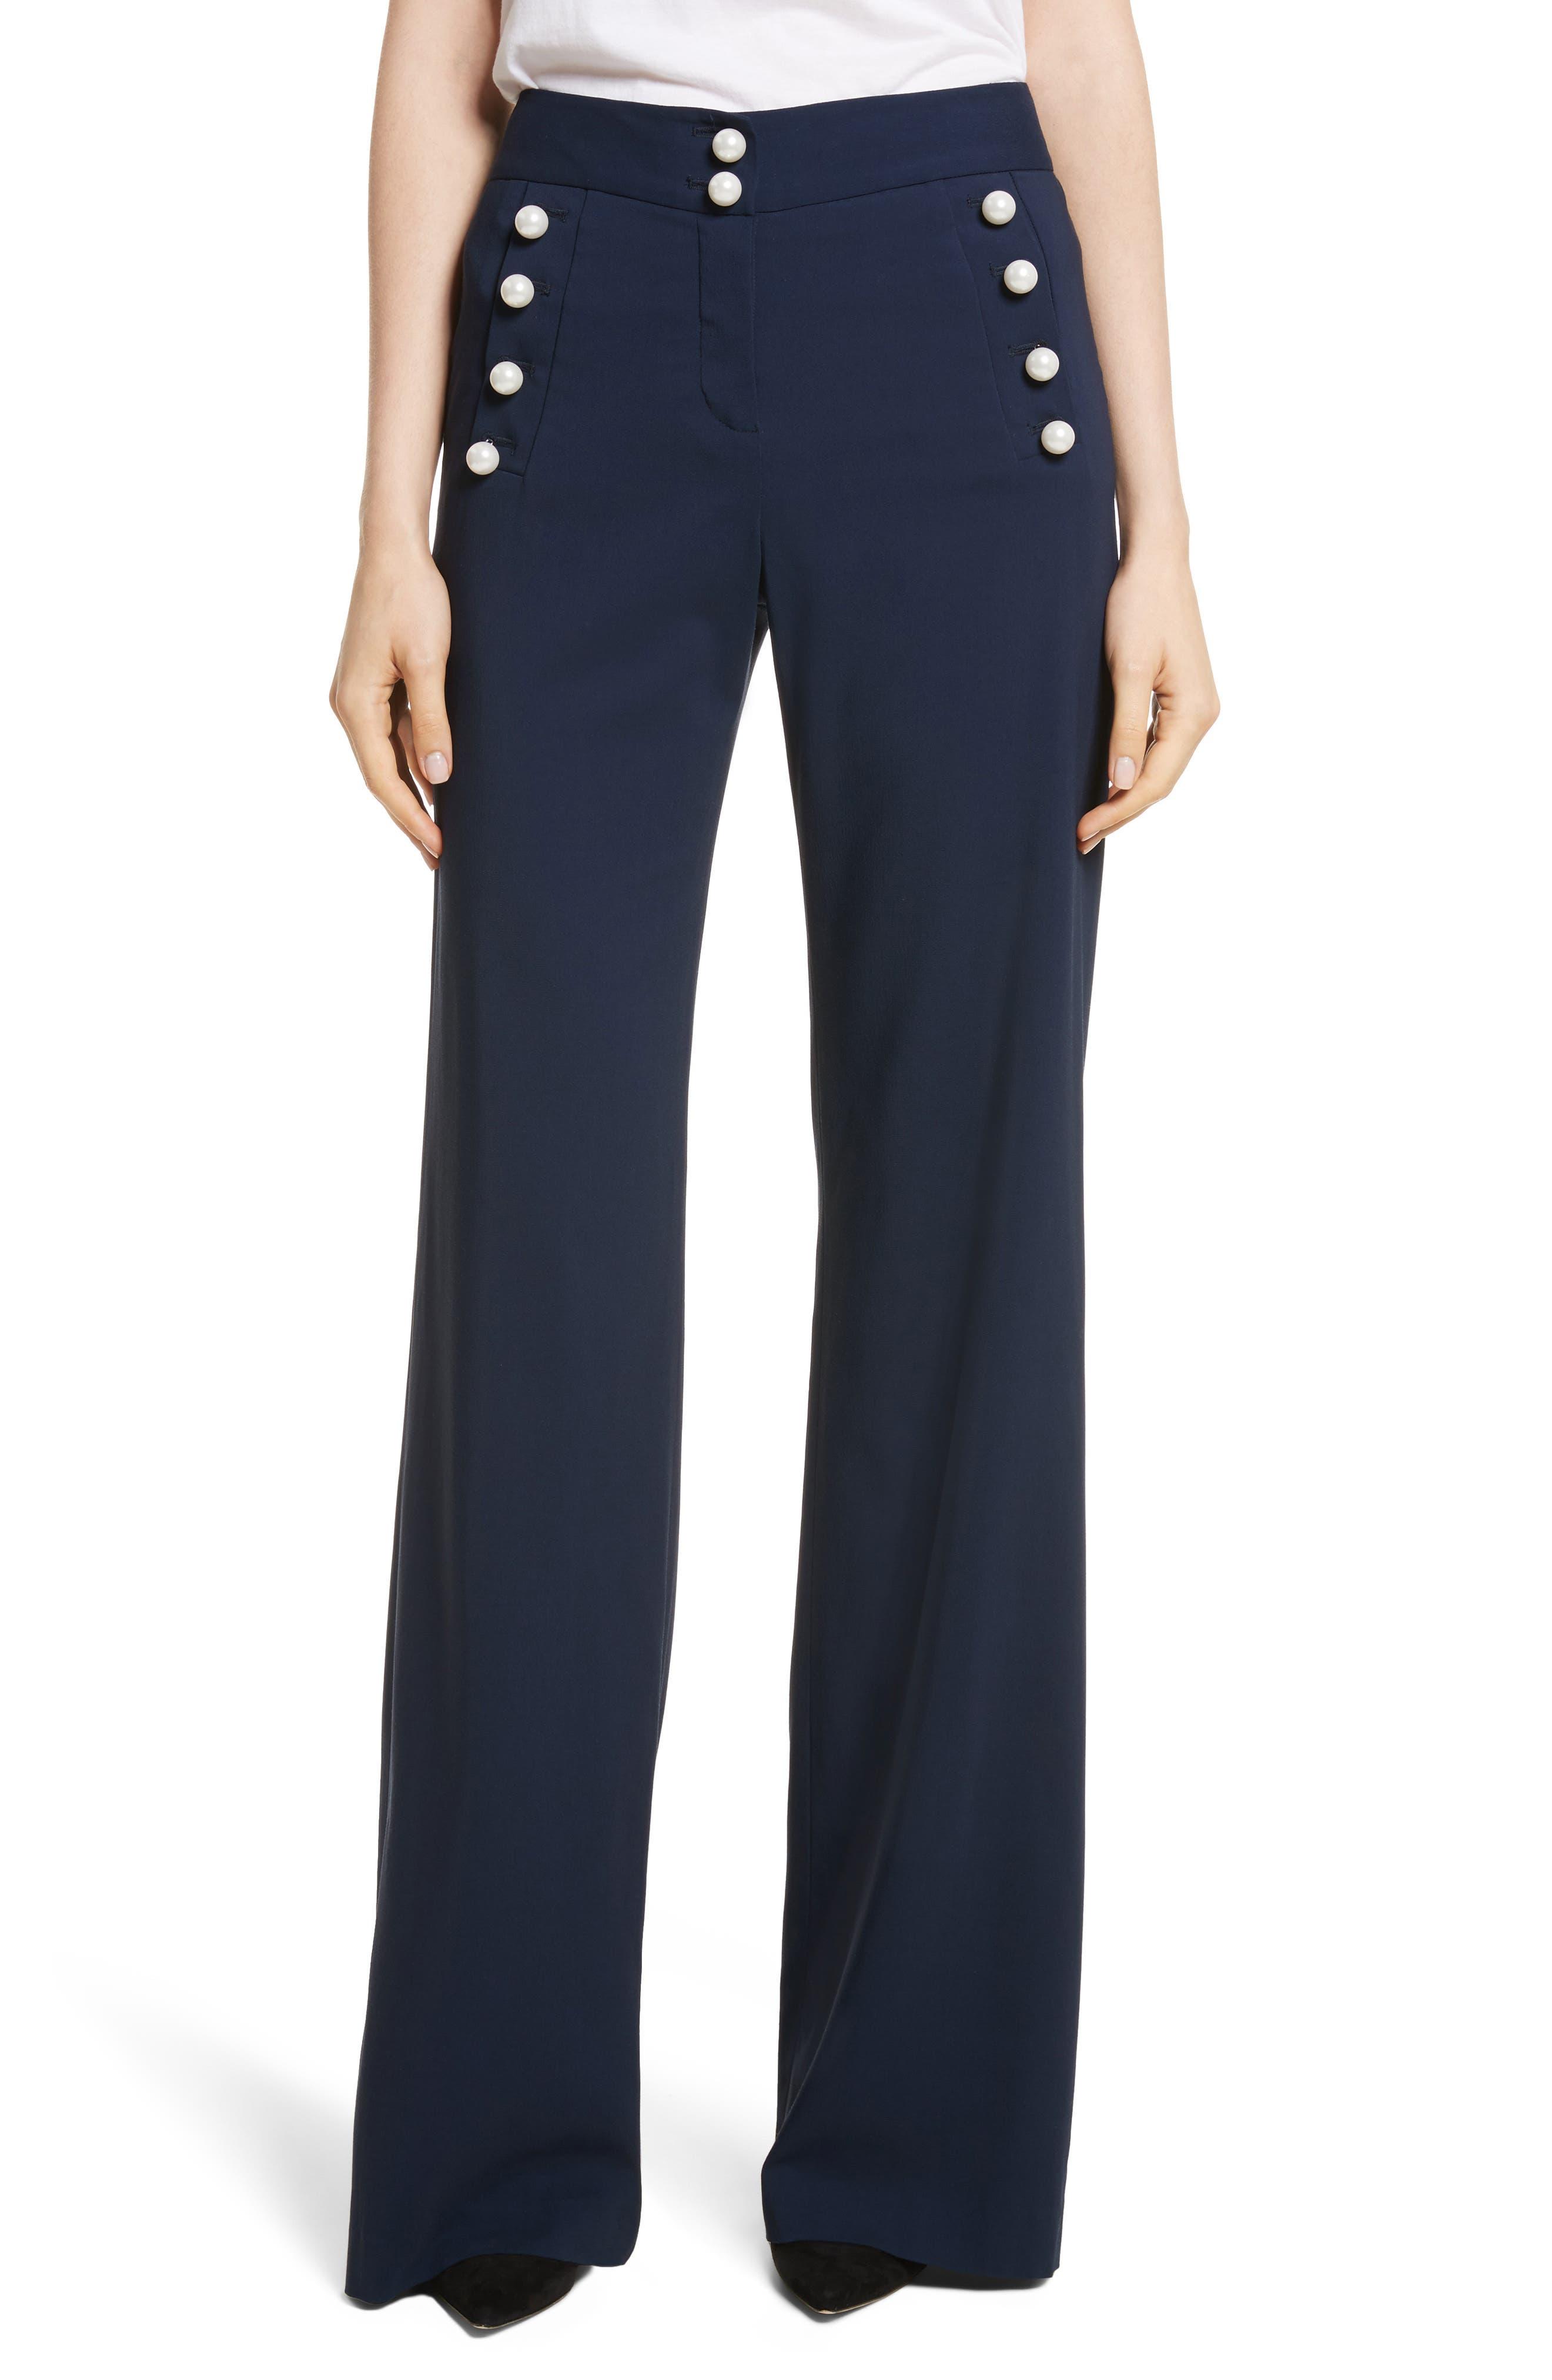 Main Image - Veronica Beard Adley Sailor Pants